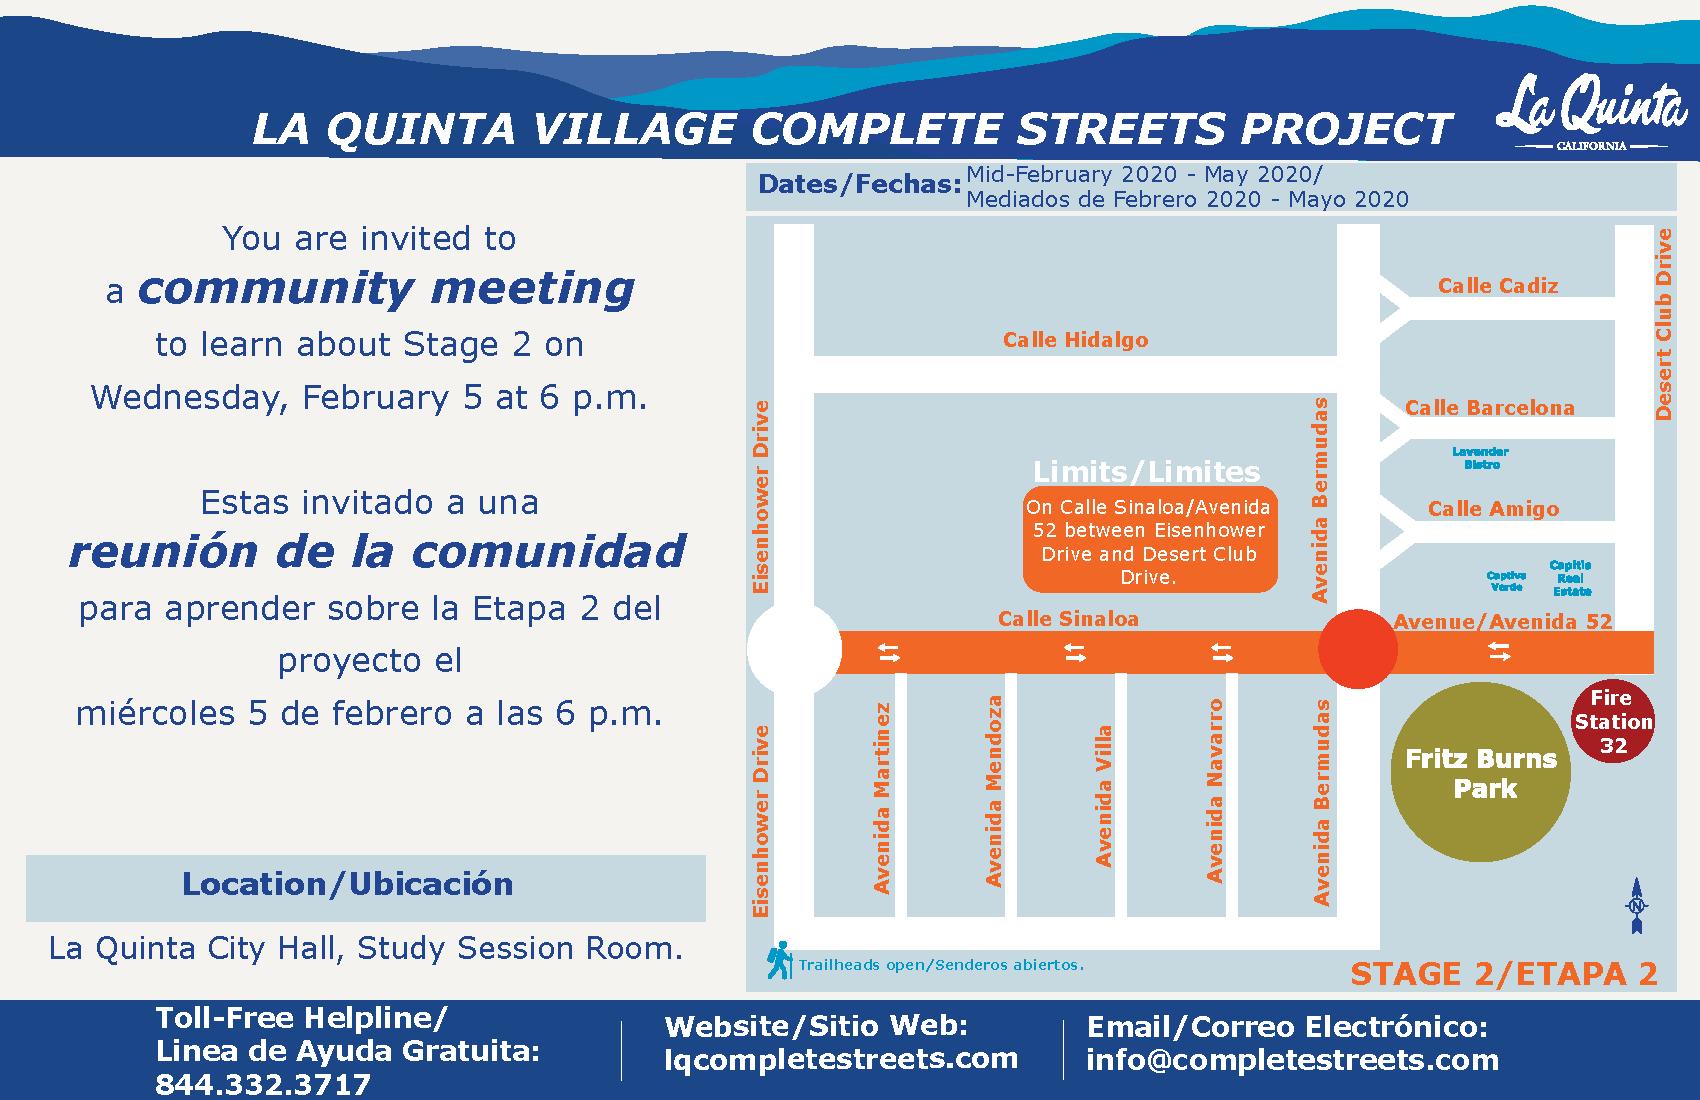 La Quinta Village Complete Streets Community Meeting